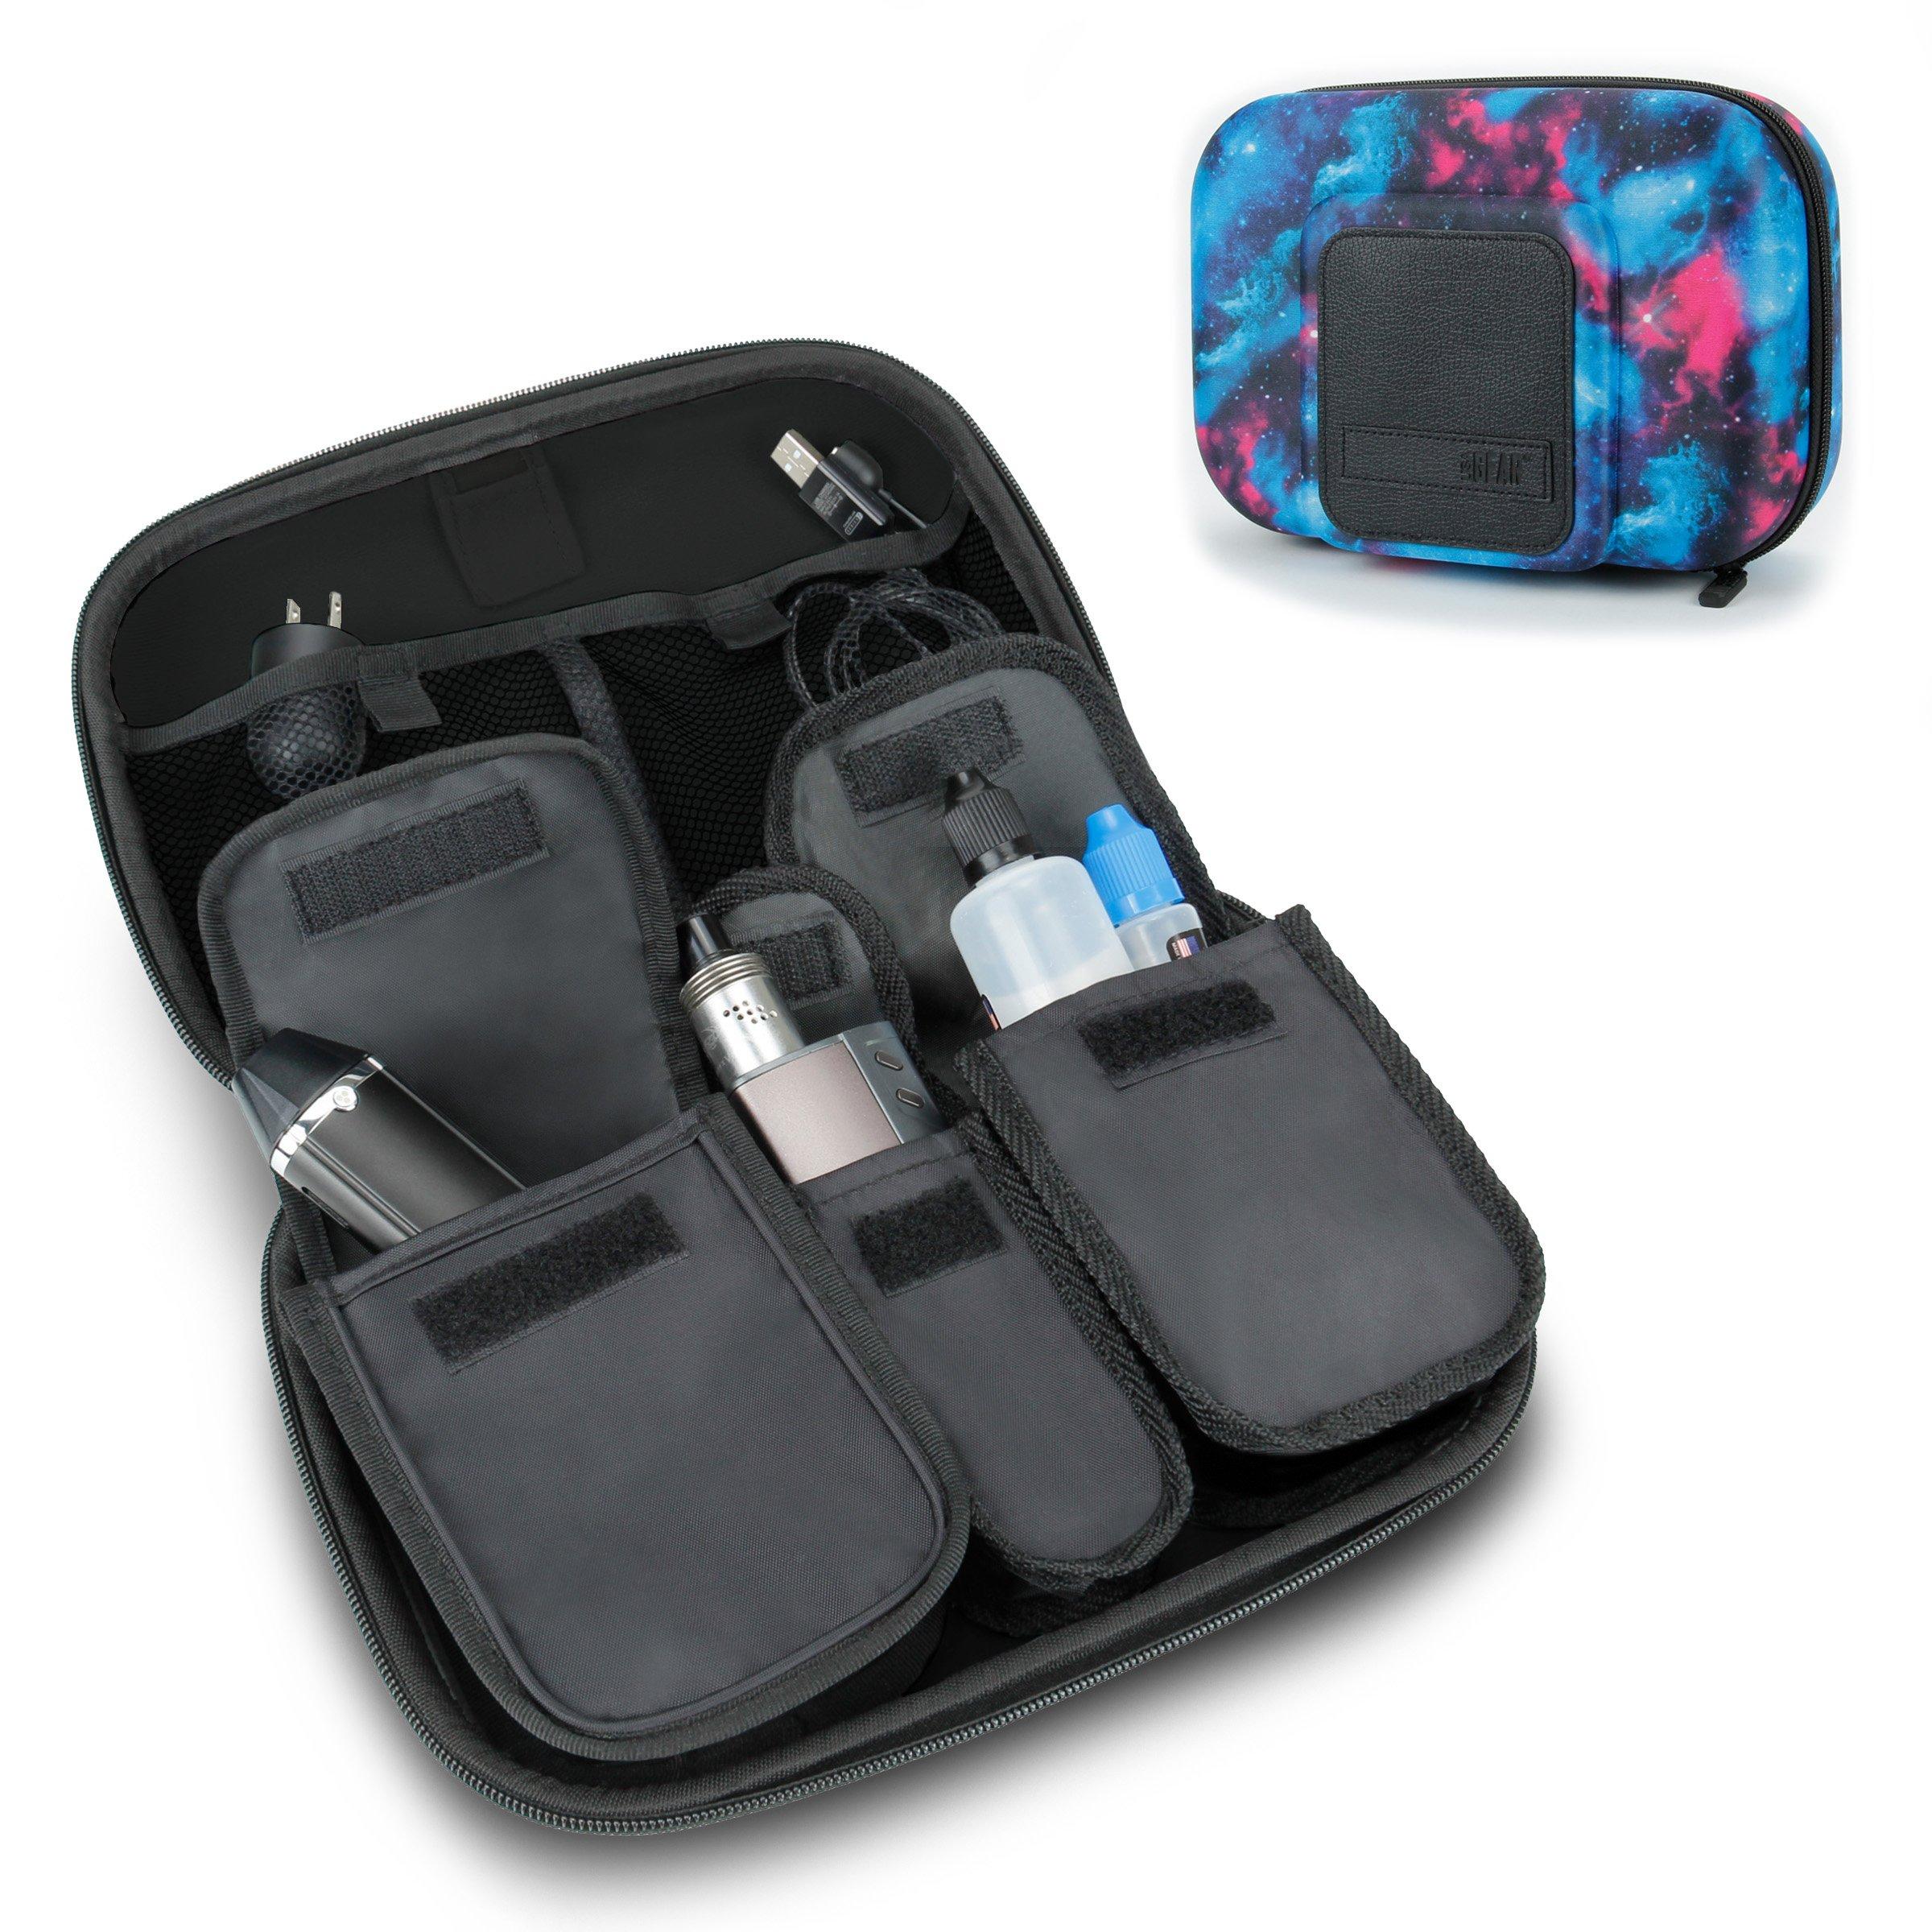 USA Gear Vape & Accessory Carrying Case Premium E-Cigarette Vape Mod Travel Pen Large Organizer - Works with blu, Innokin, Janty, Halo Cigs, 777 E-Cigs and More Electronic Cigarettes